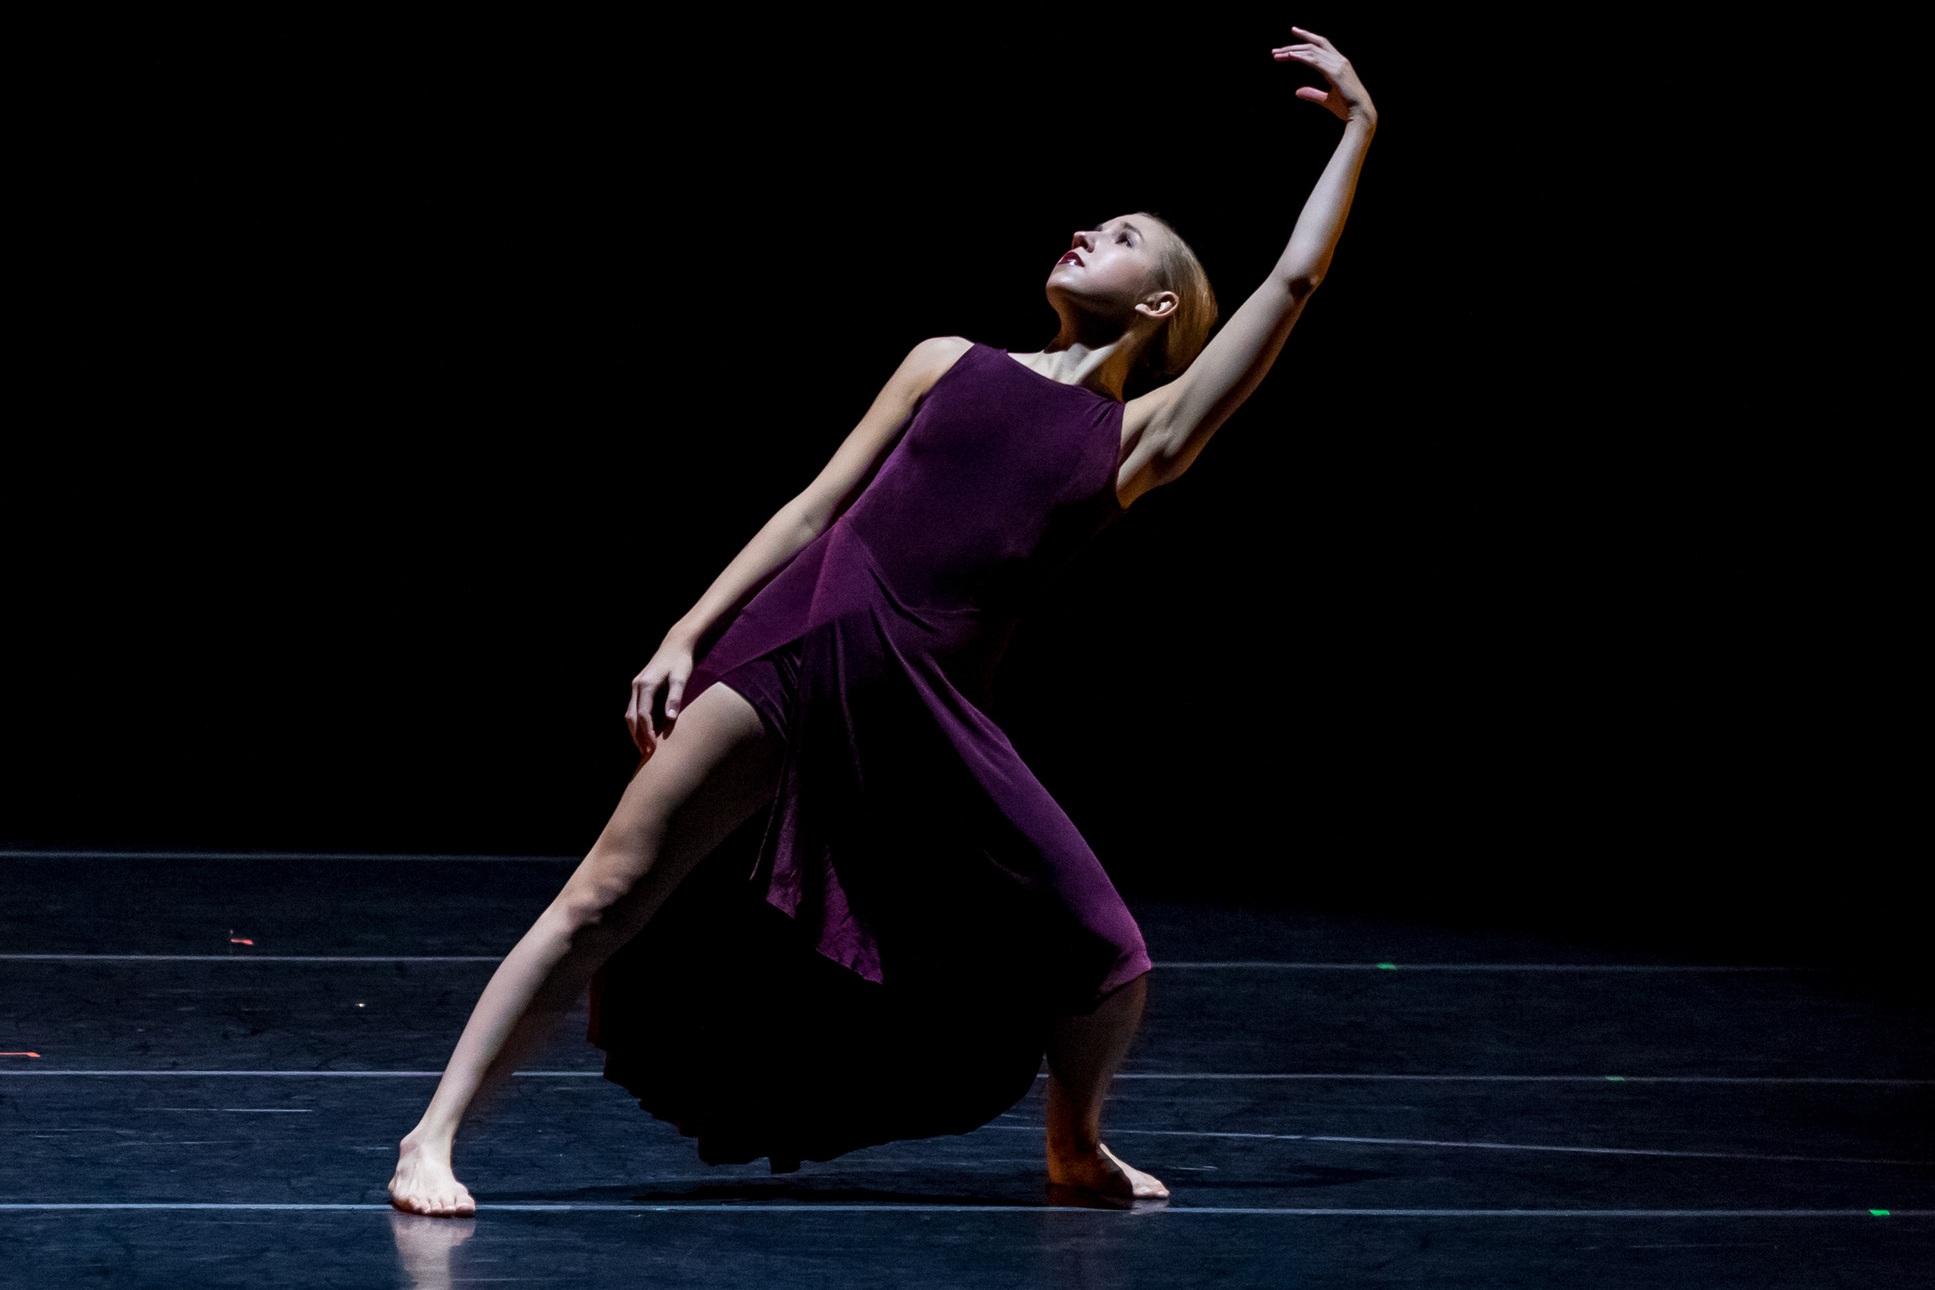 Kat+Barragan+Dance-0211-ZF-2123-47412-1-001-002.jpg